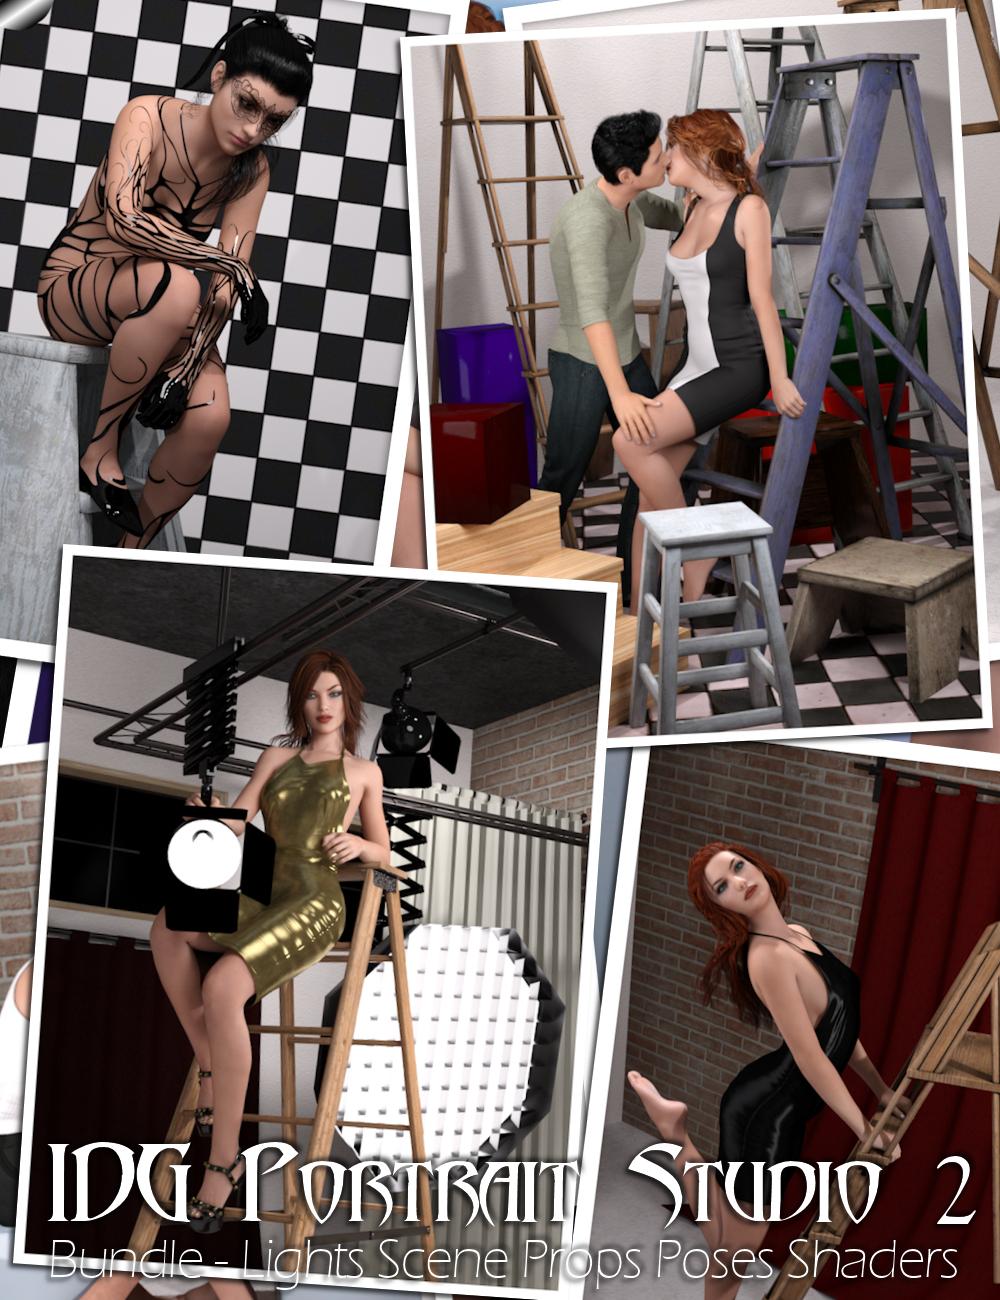 IDG Portrait Studio 2 Bundle by: IDG DesignsDestinysGardenInaneGlory, 3D Models by Daz 3D